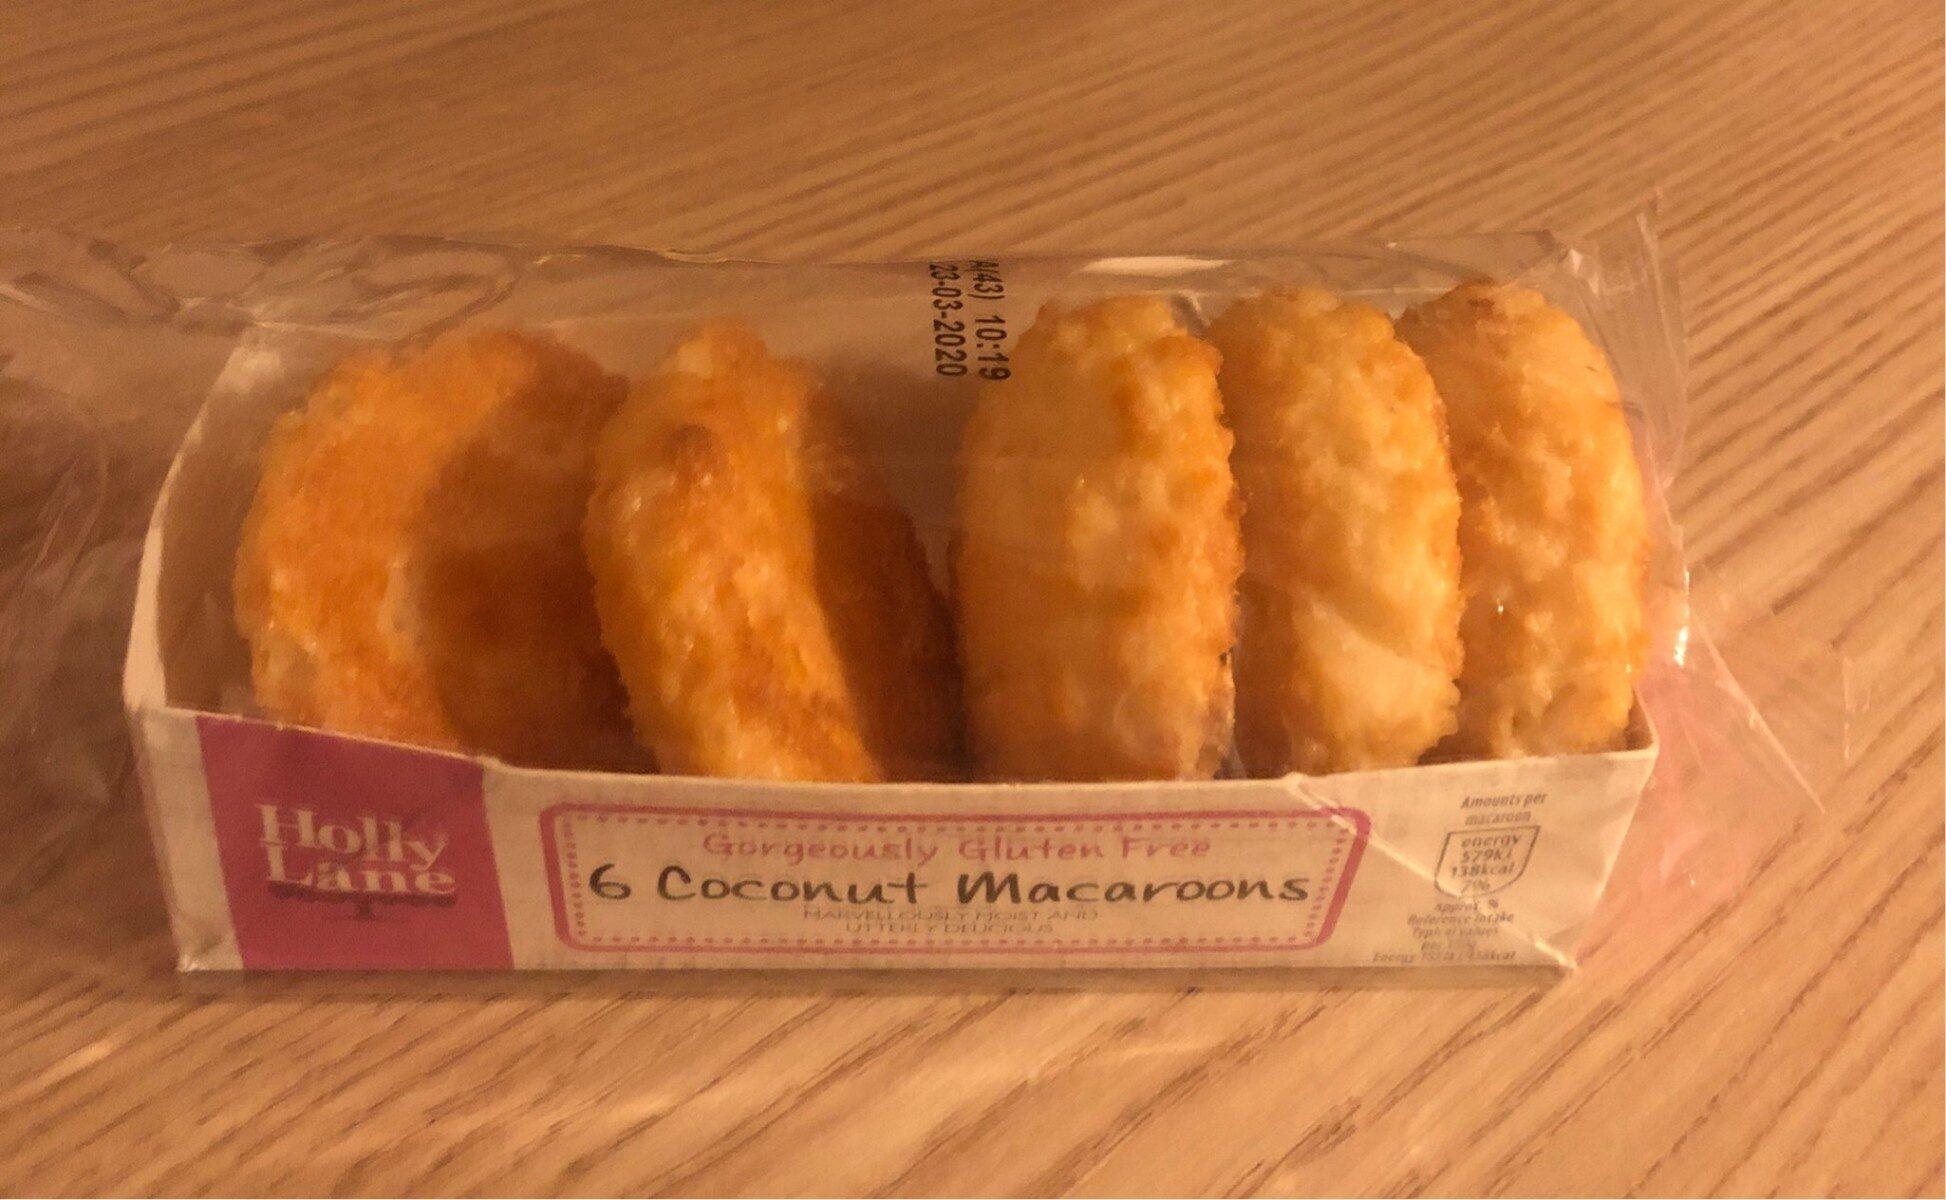 6 Coconut Macaroons - Produit - en